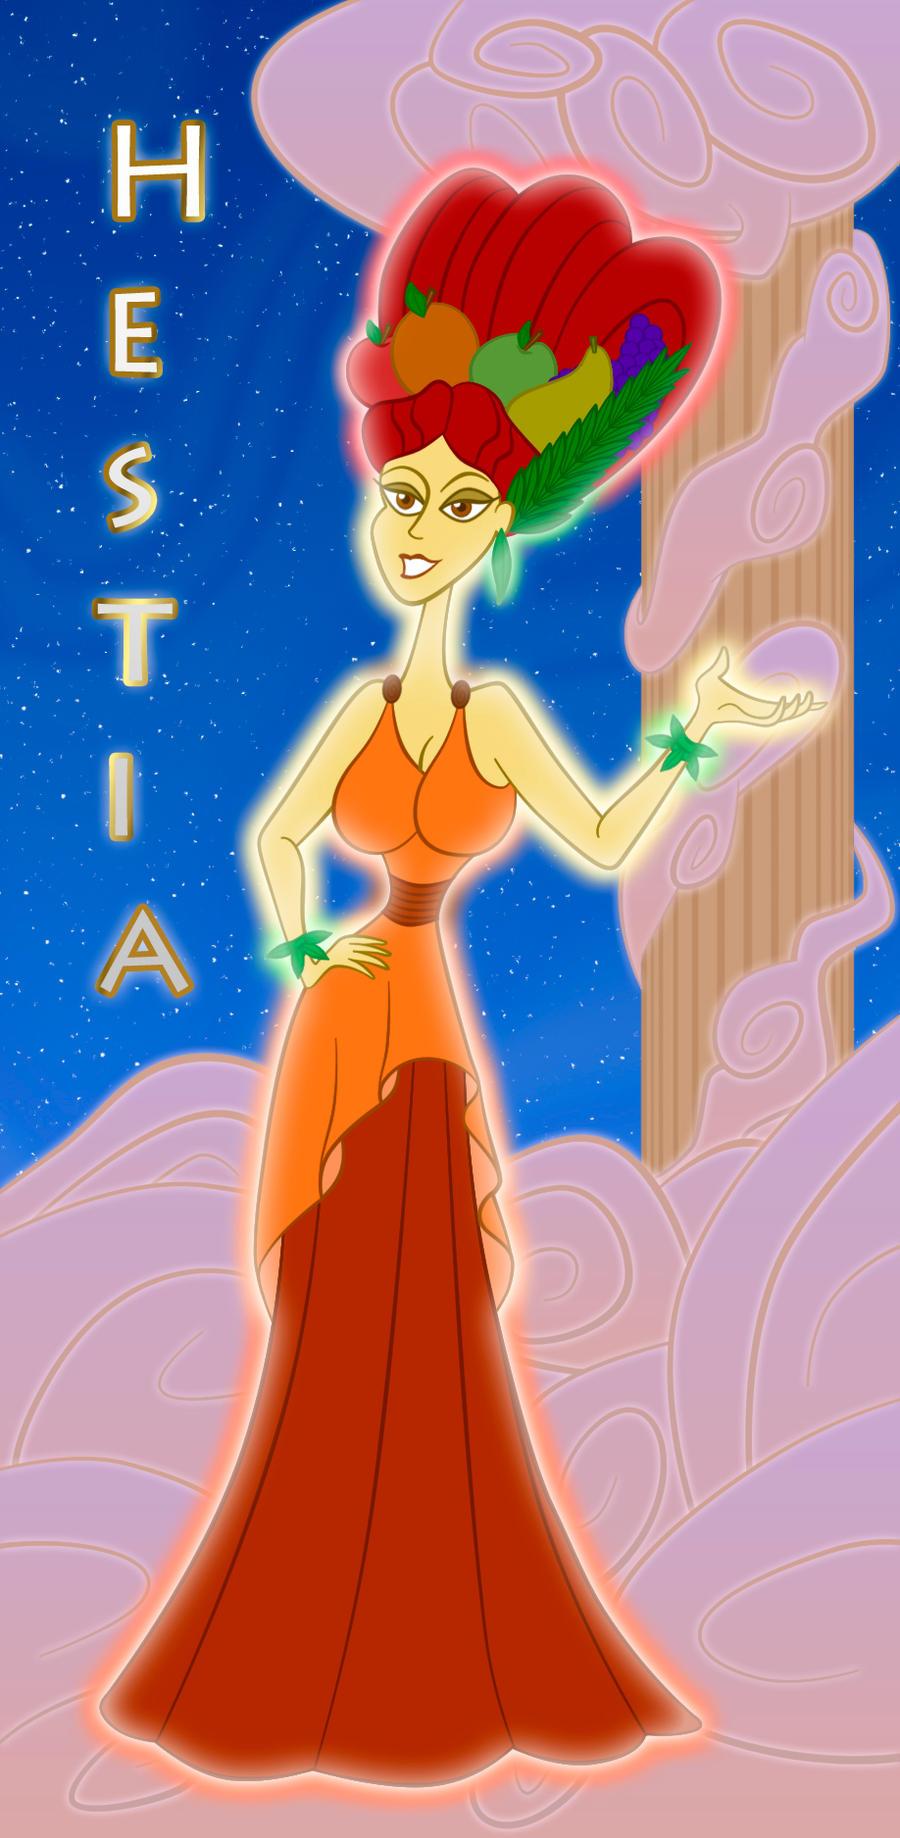 Hestia - Vesta by 666-...